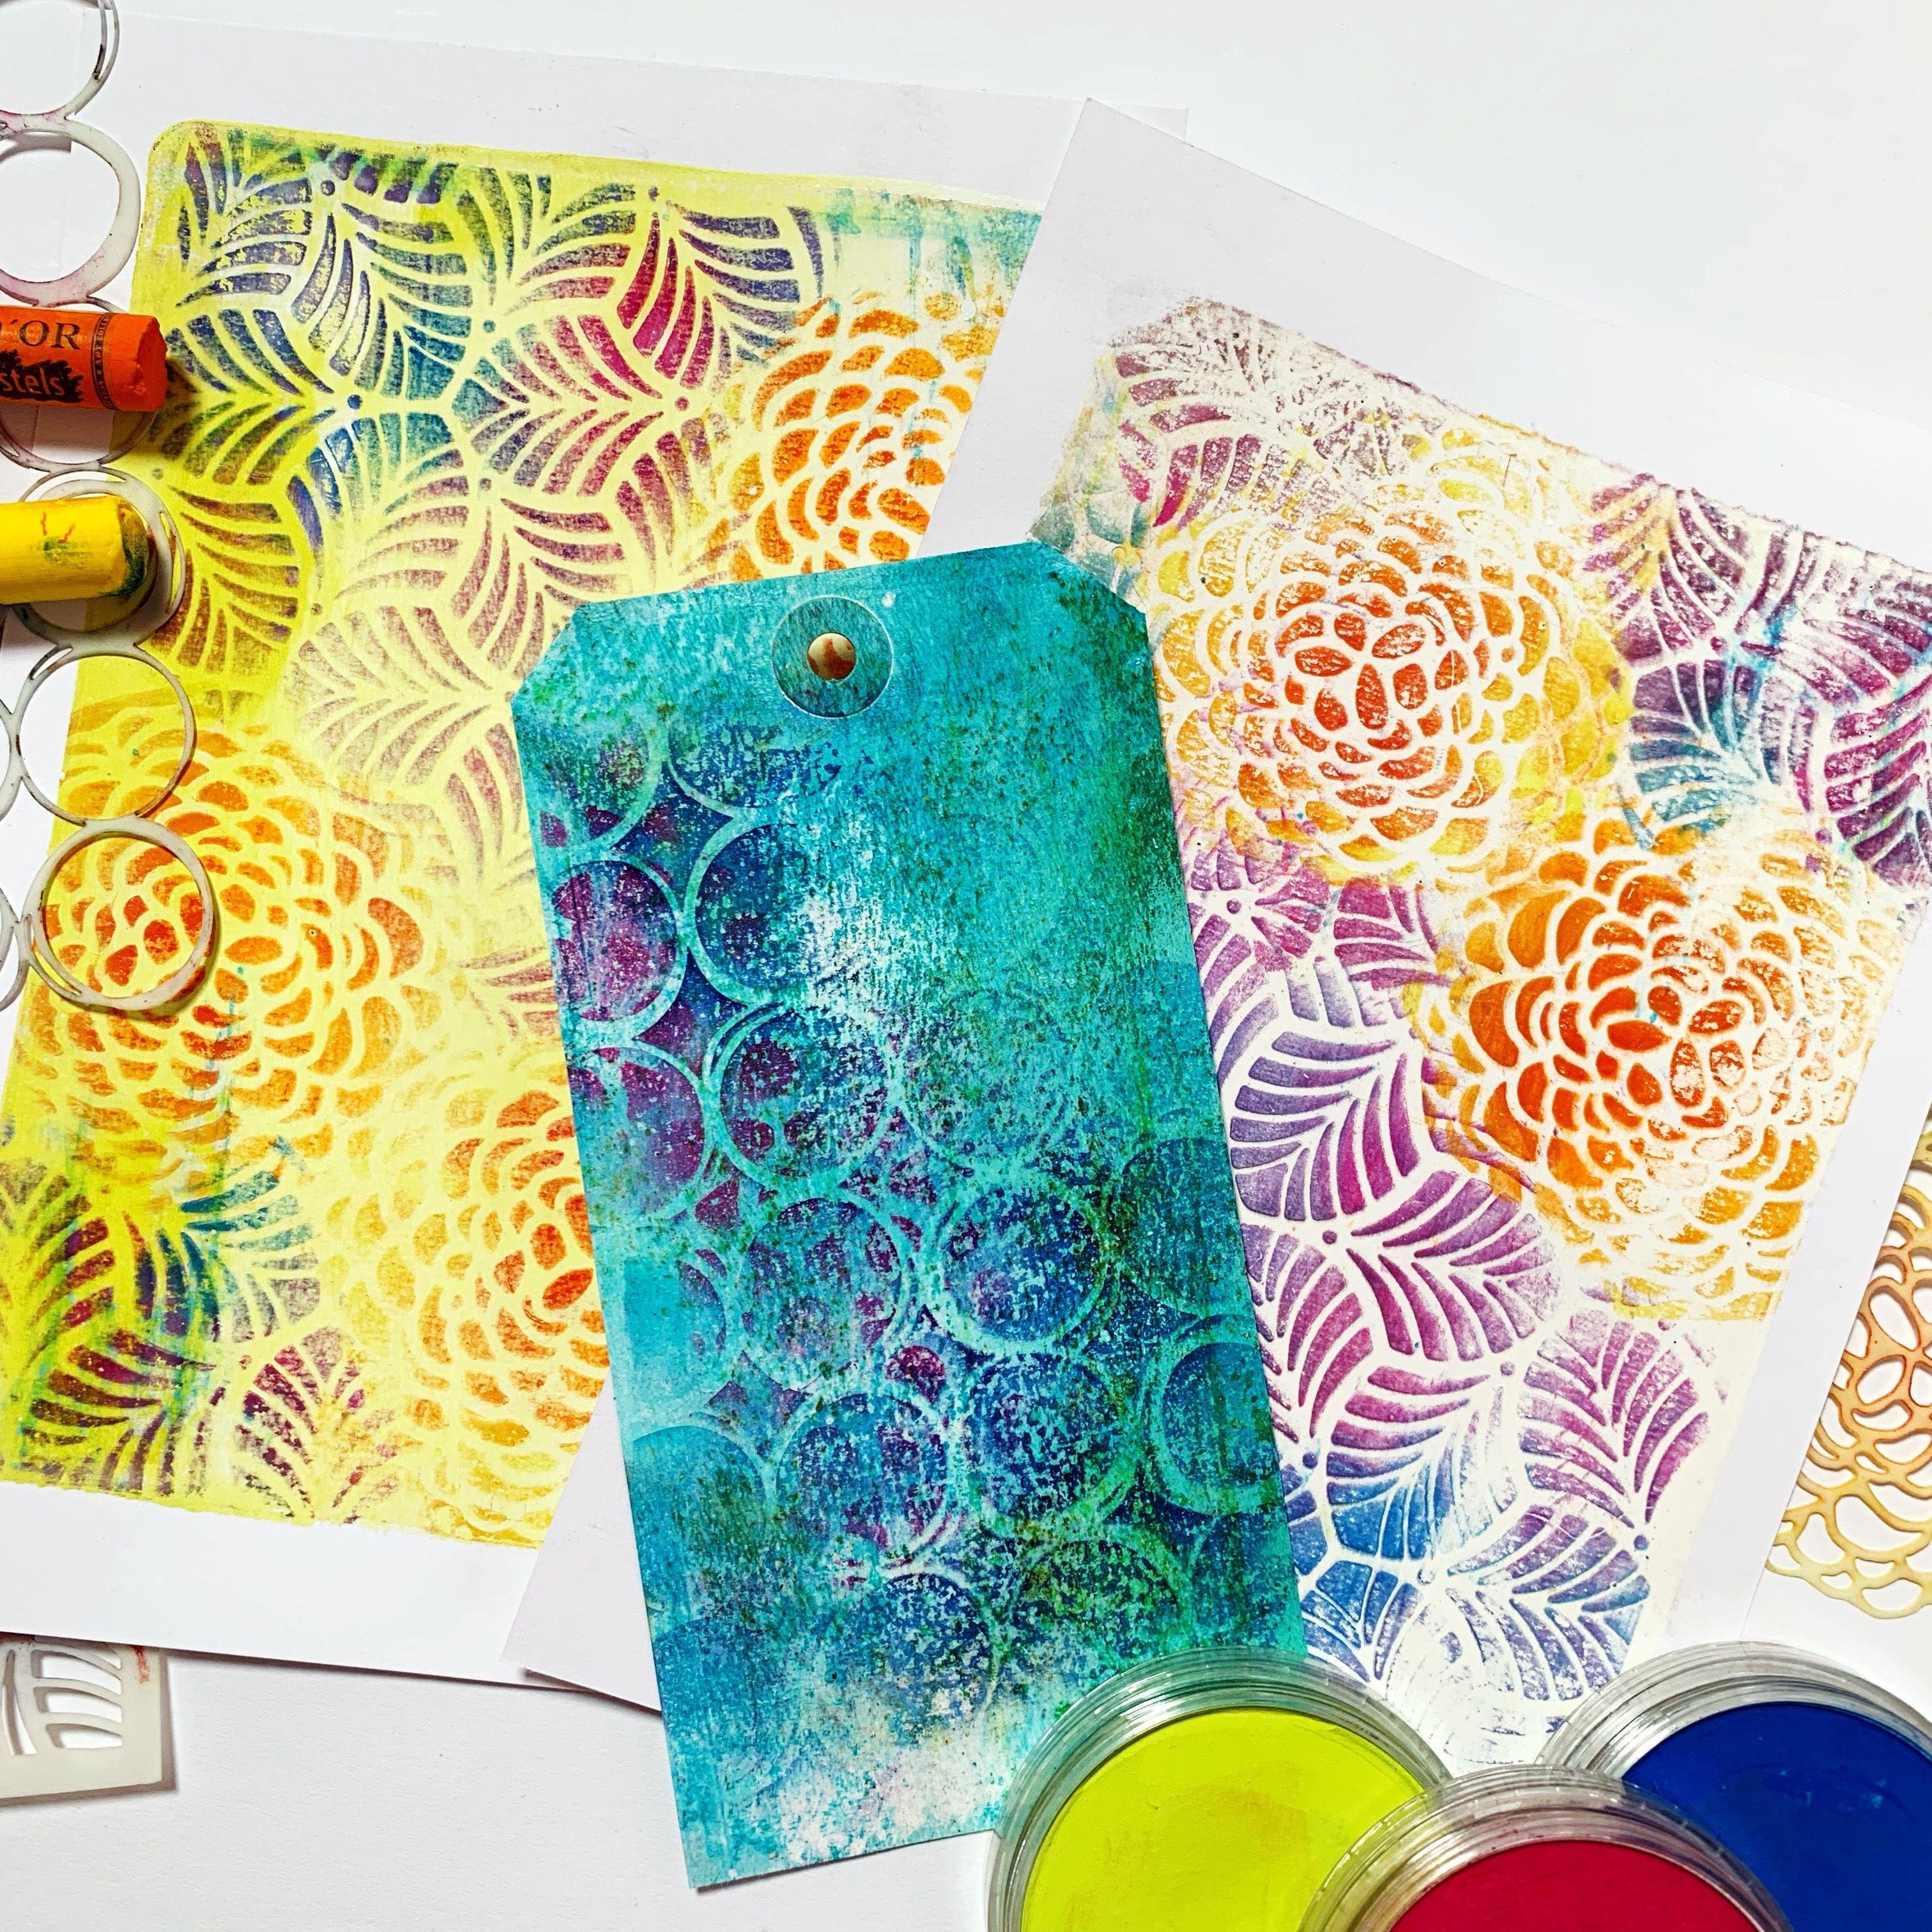 Gelli Arts Printing With Stencils And Pastel Gelli Plate Art Gelli Plate Techniques Gelli Printing Tutorials